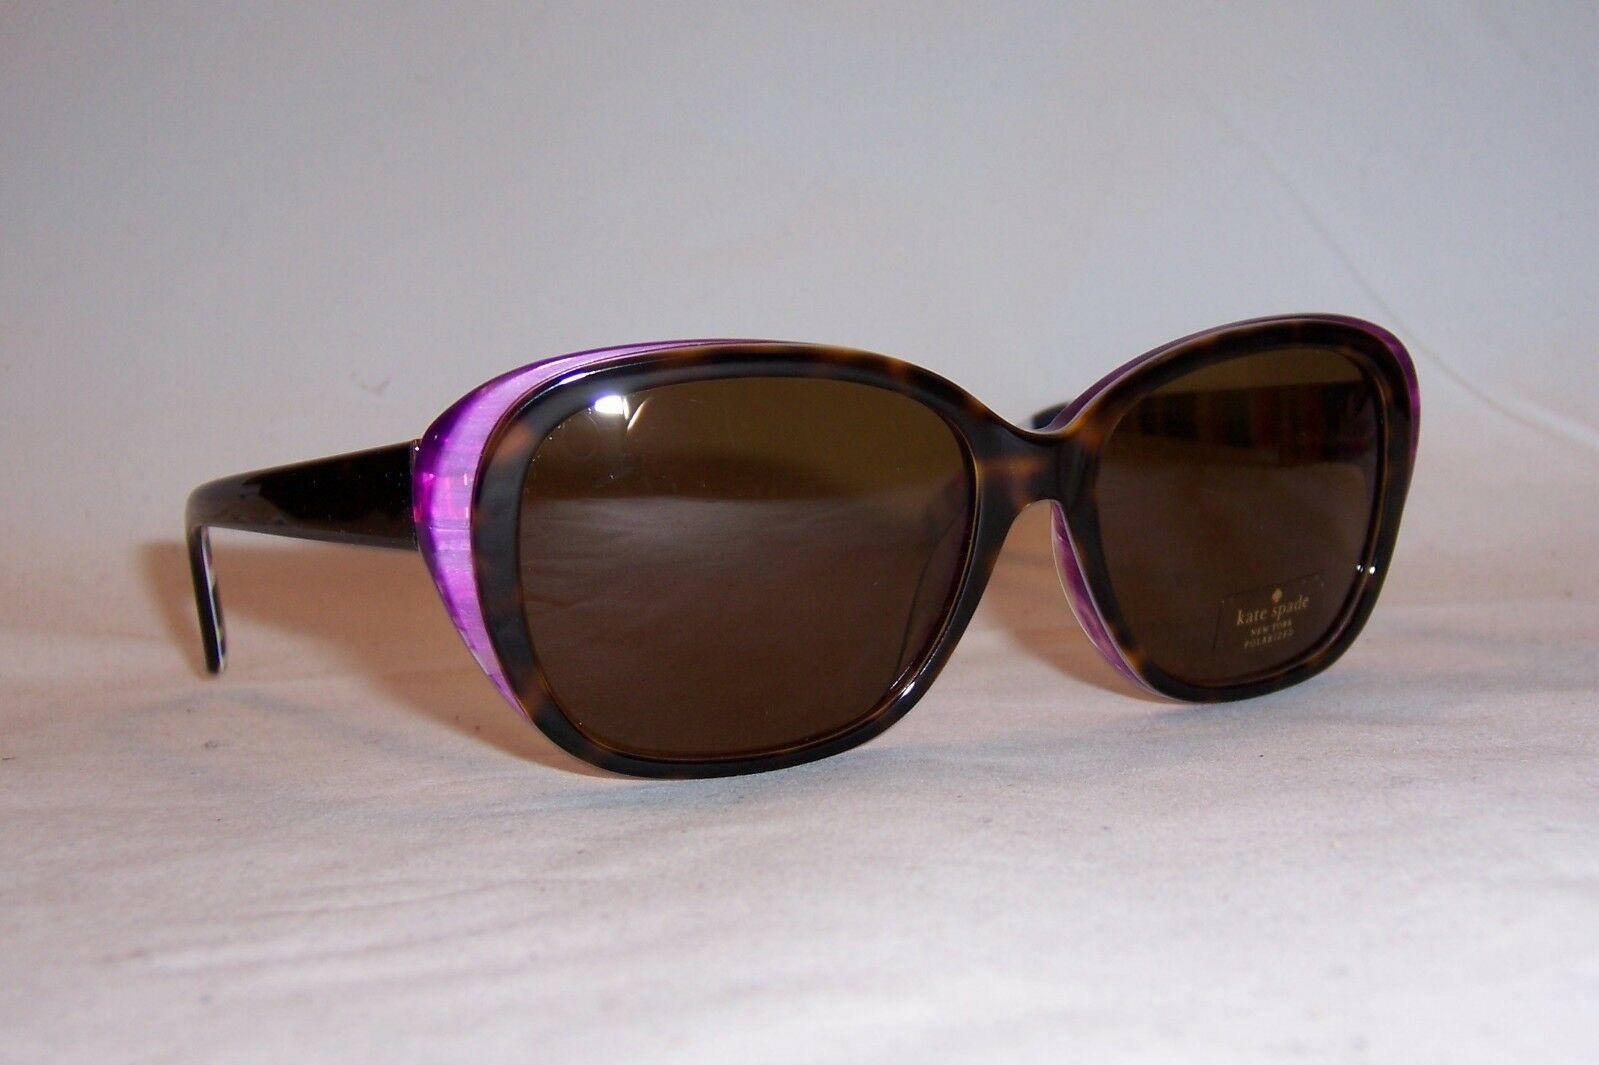 Kate Spade polarized tortoiseshell Brown sunglasses sunglasses Hilde / P / s x72p-vw